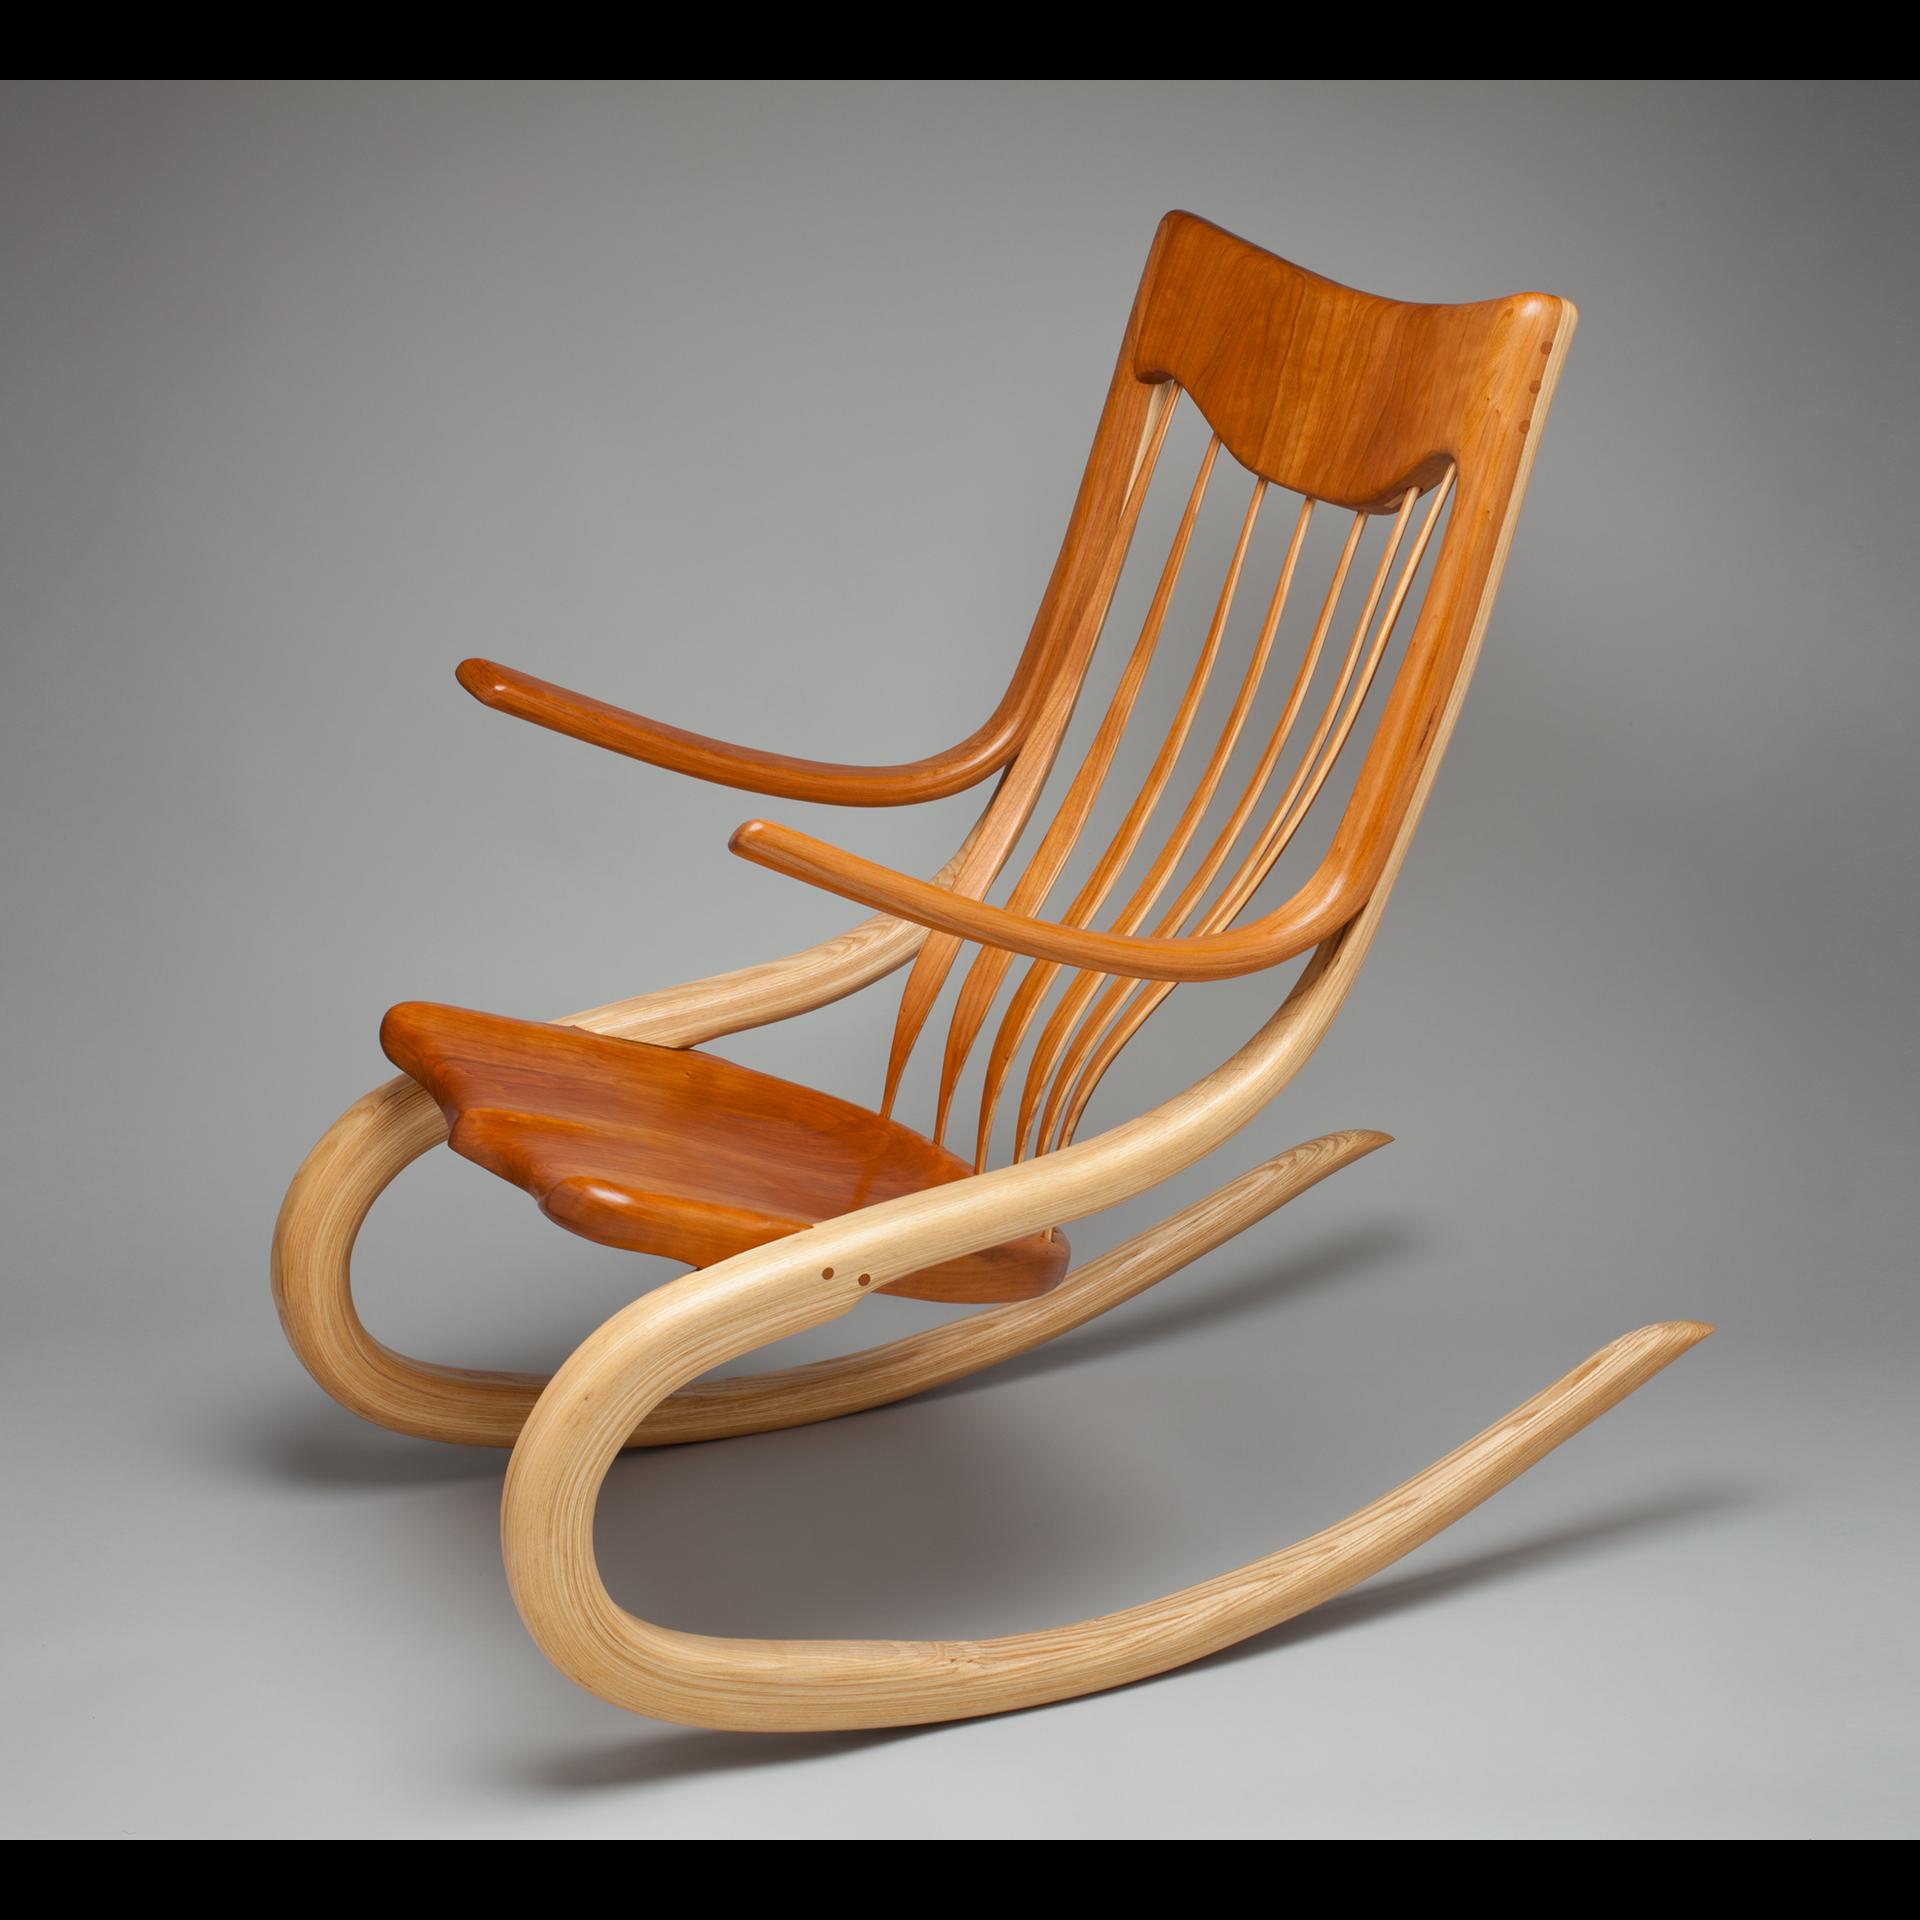 bent wood rocking chair the best massage bentwood rocker shangrilawoodworks s blog shangraw 21079 zapp